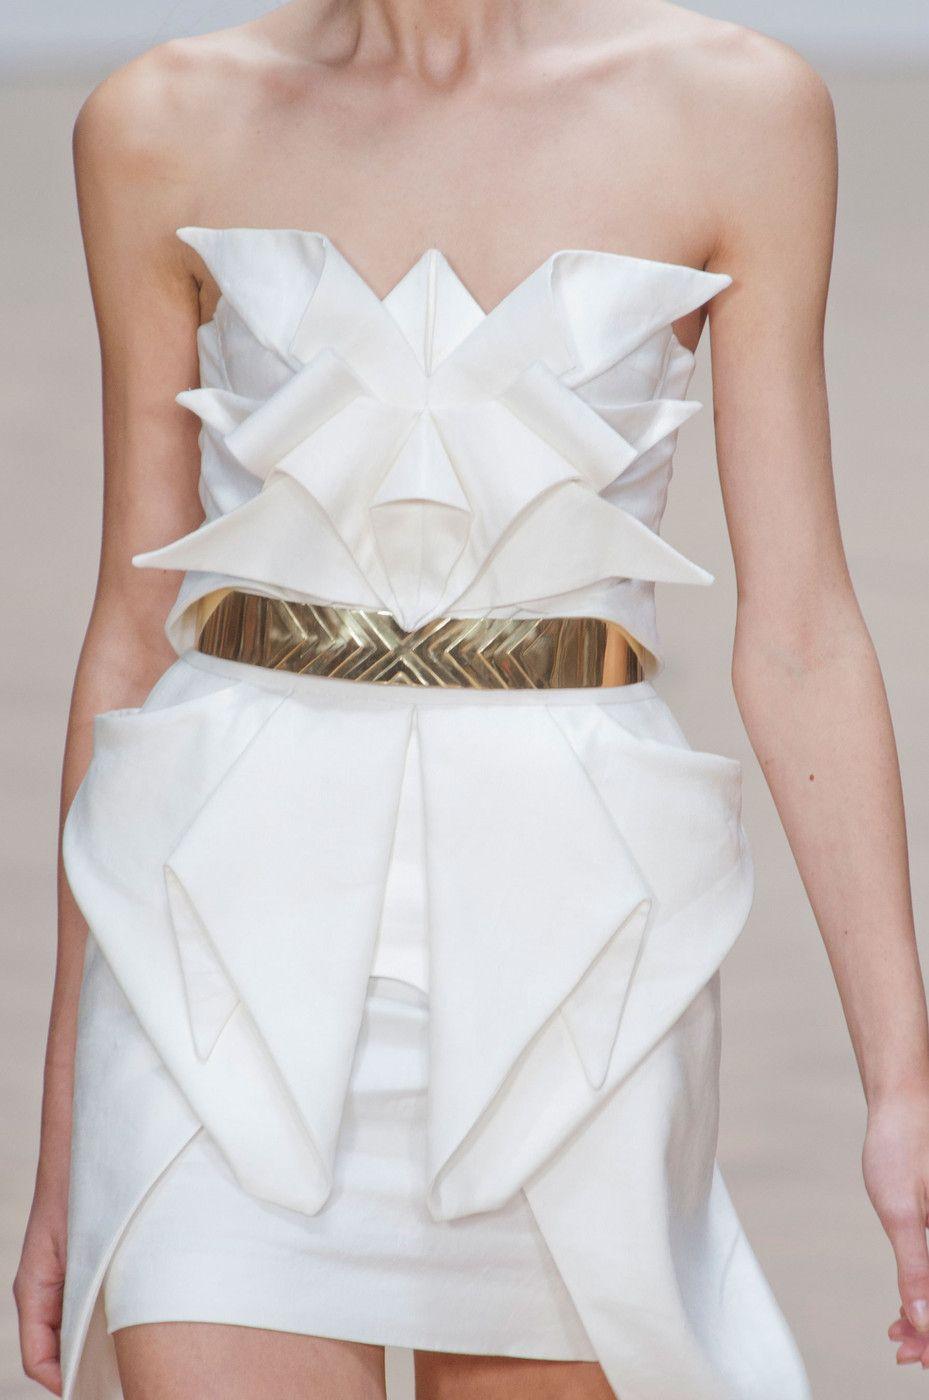 Origami dress with a beautiful use of fabric manipulation to origami dress with a beautiful use of fabric manipulation to create structure symmetry through dimensional jeuxipadfo Choice Image